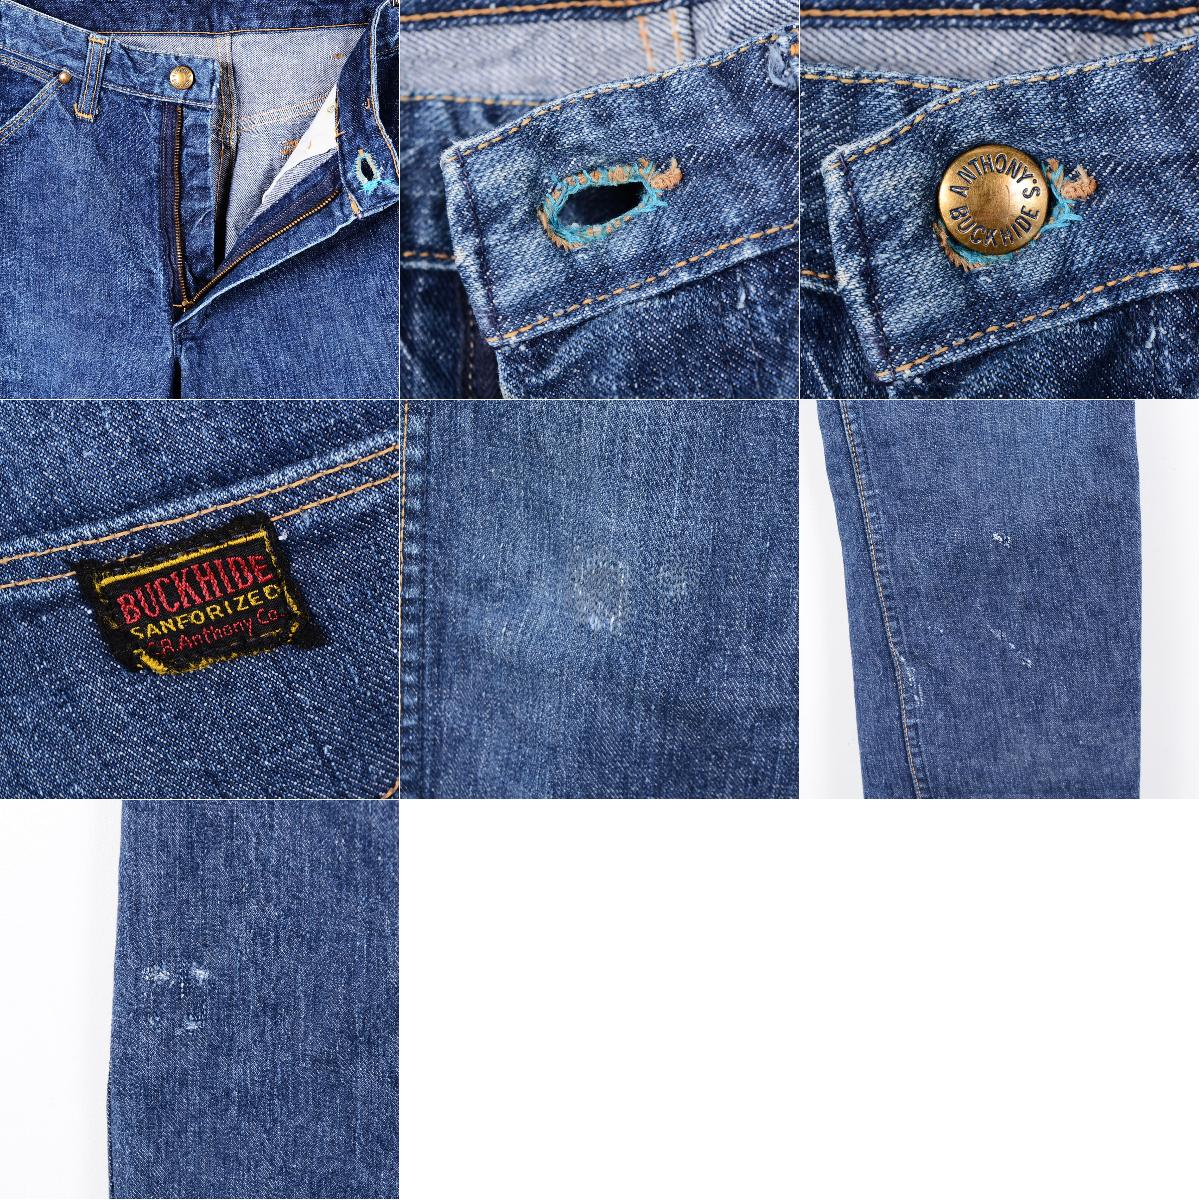 60年代BUCK HIDE牛仔裤笔直牛仔裤人w30复古C.R ANTHONY CO. /wen5812 160310